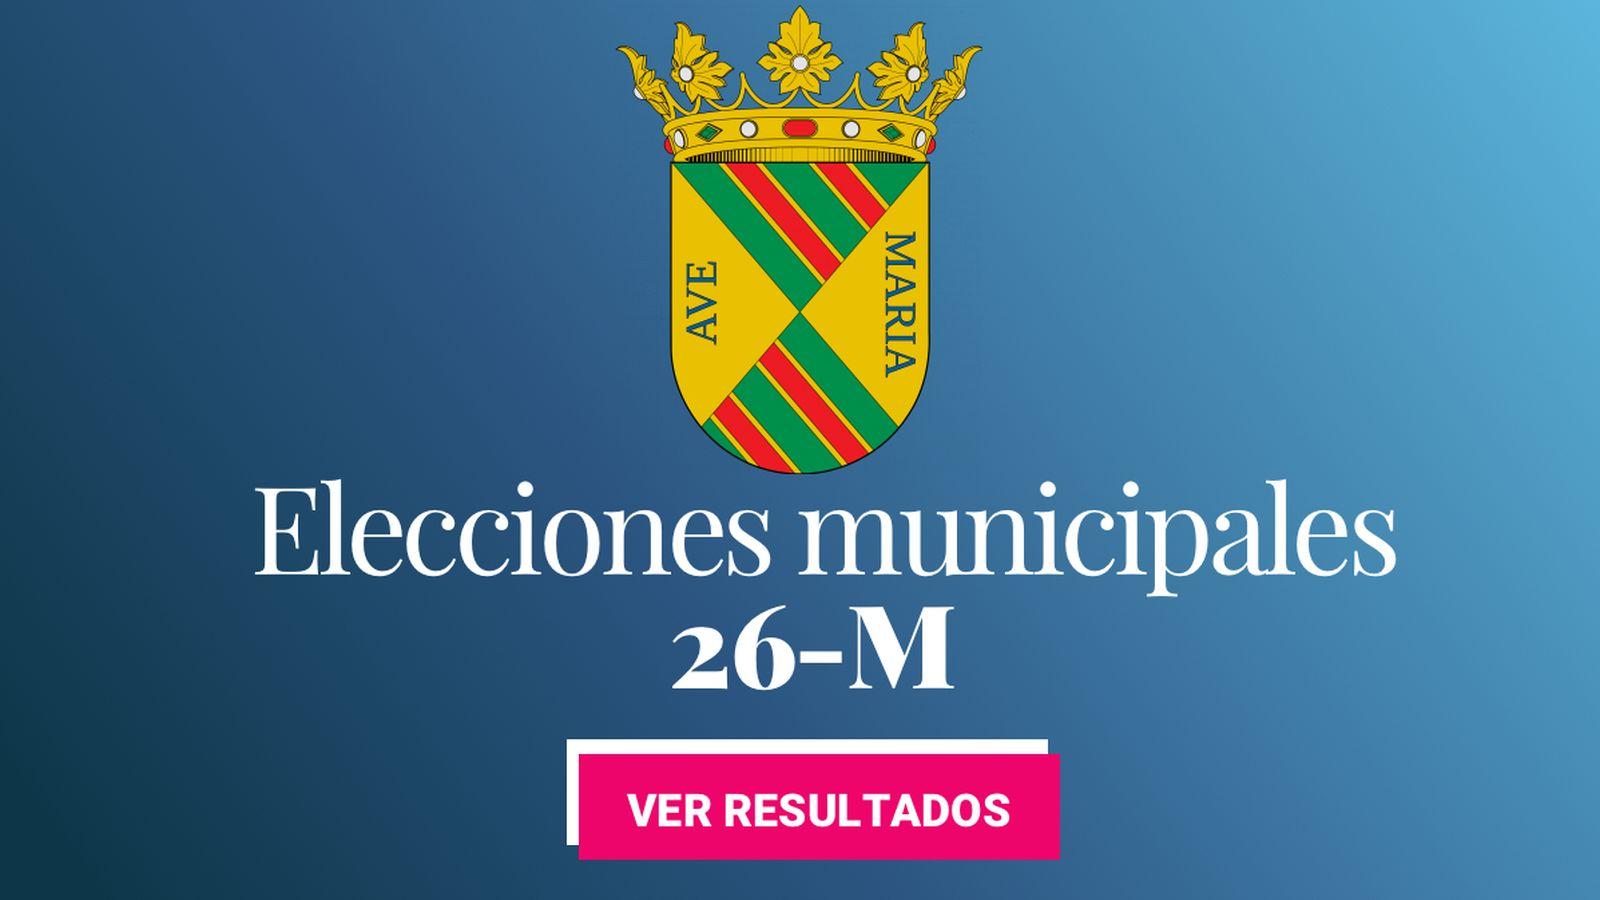 Foto: Elecciones municipales 2019 en Torrelavega. (C.C./EC)